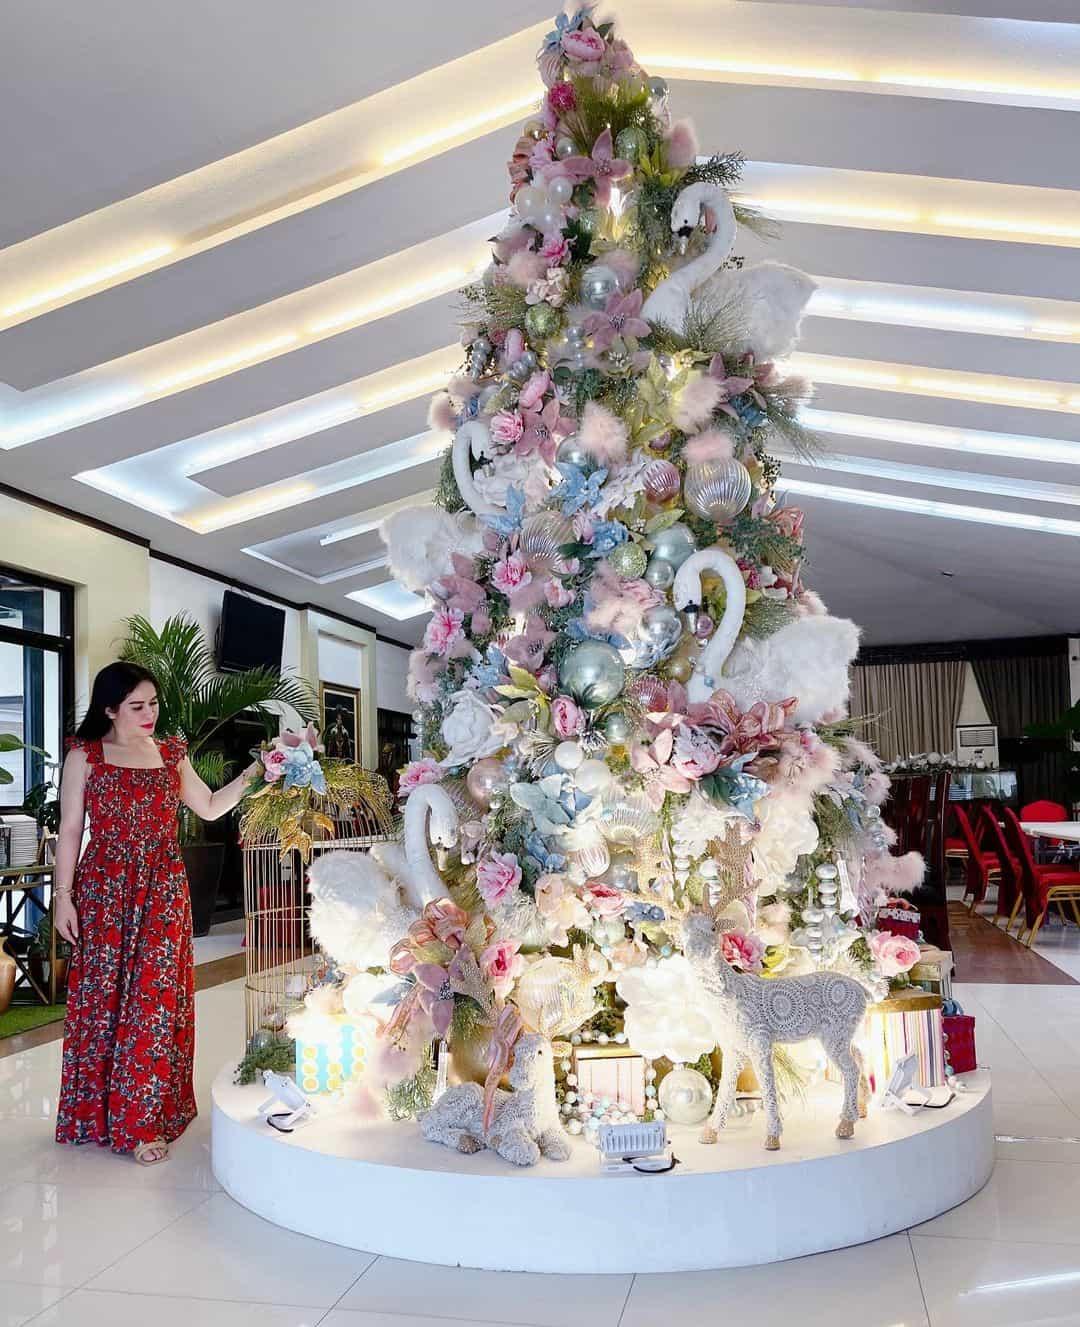 Jinkee Pacquiao's 2020 Christmas tree in General Santos